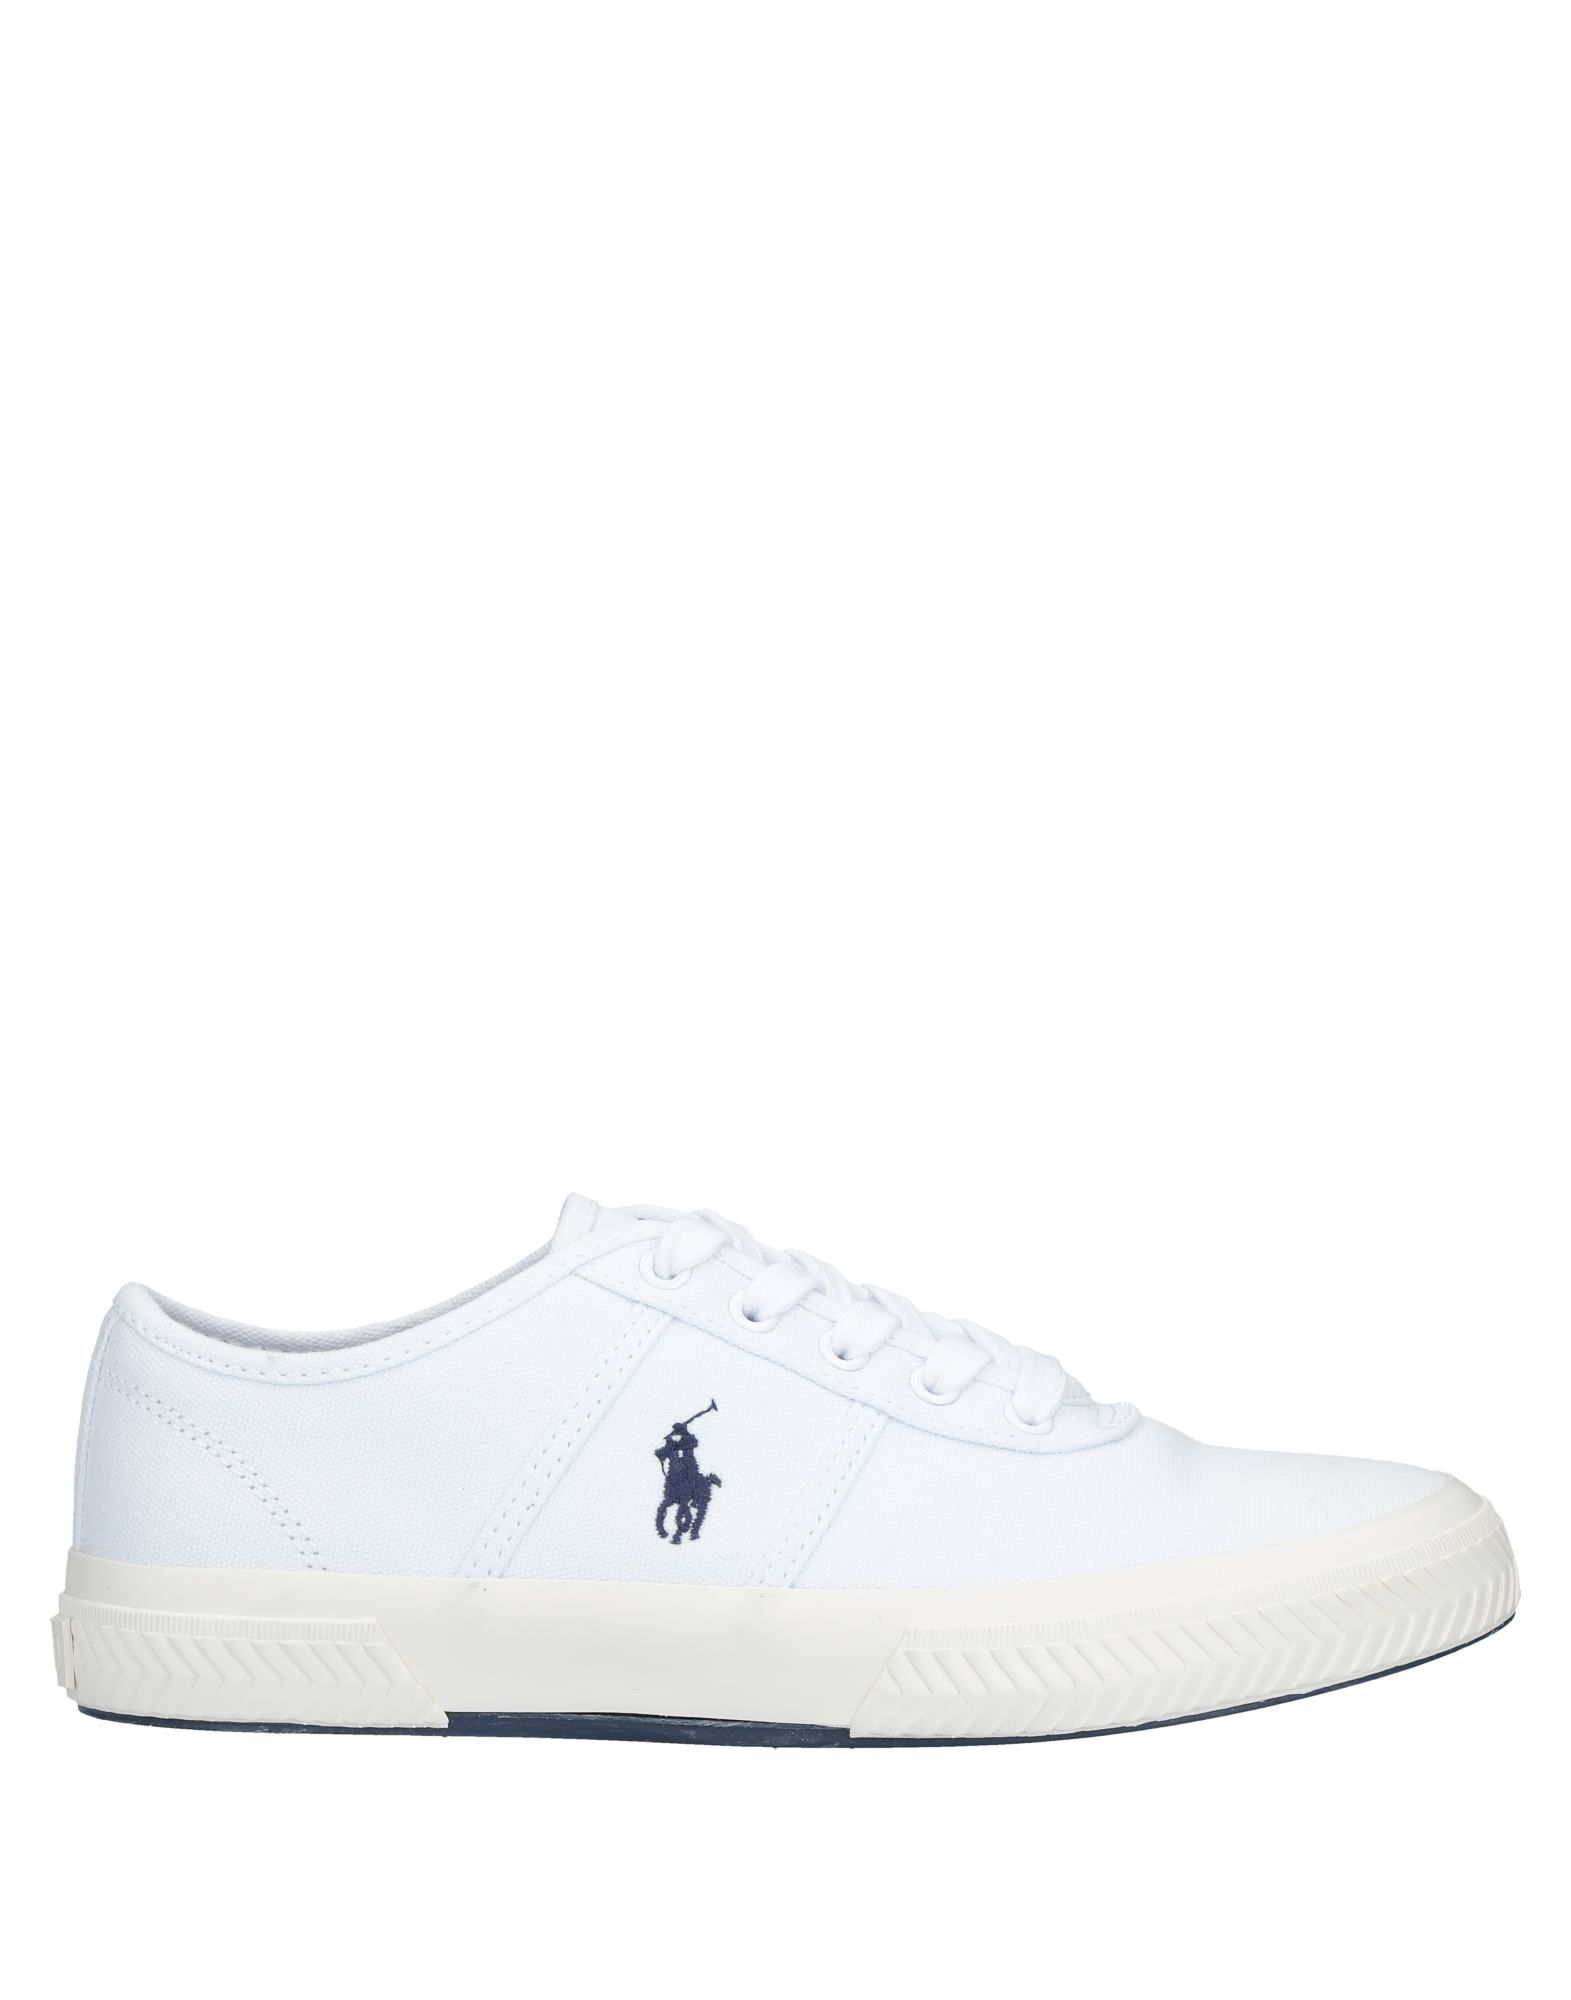 Rabatt echte Schuhe Polo  Ralph Lauren Sneakers Herren  Polo 11203536JC 69e073